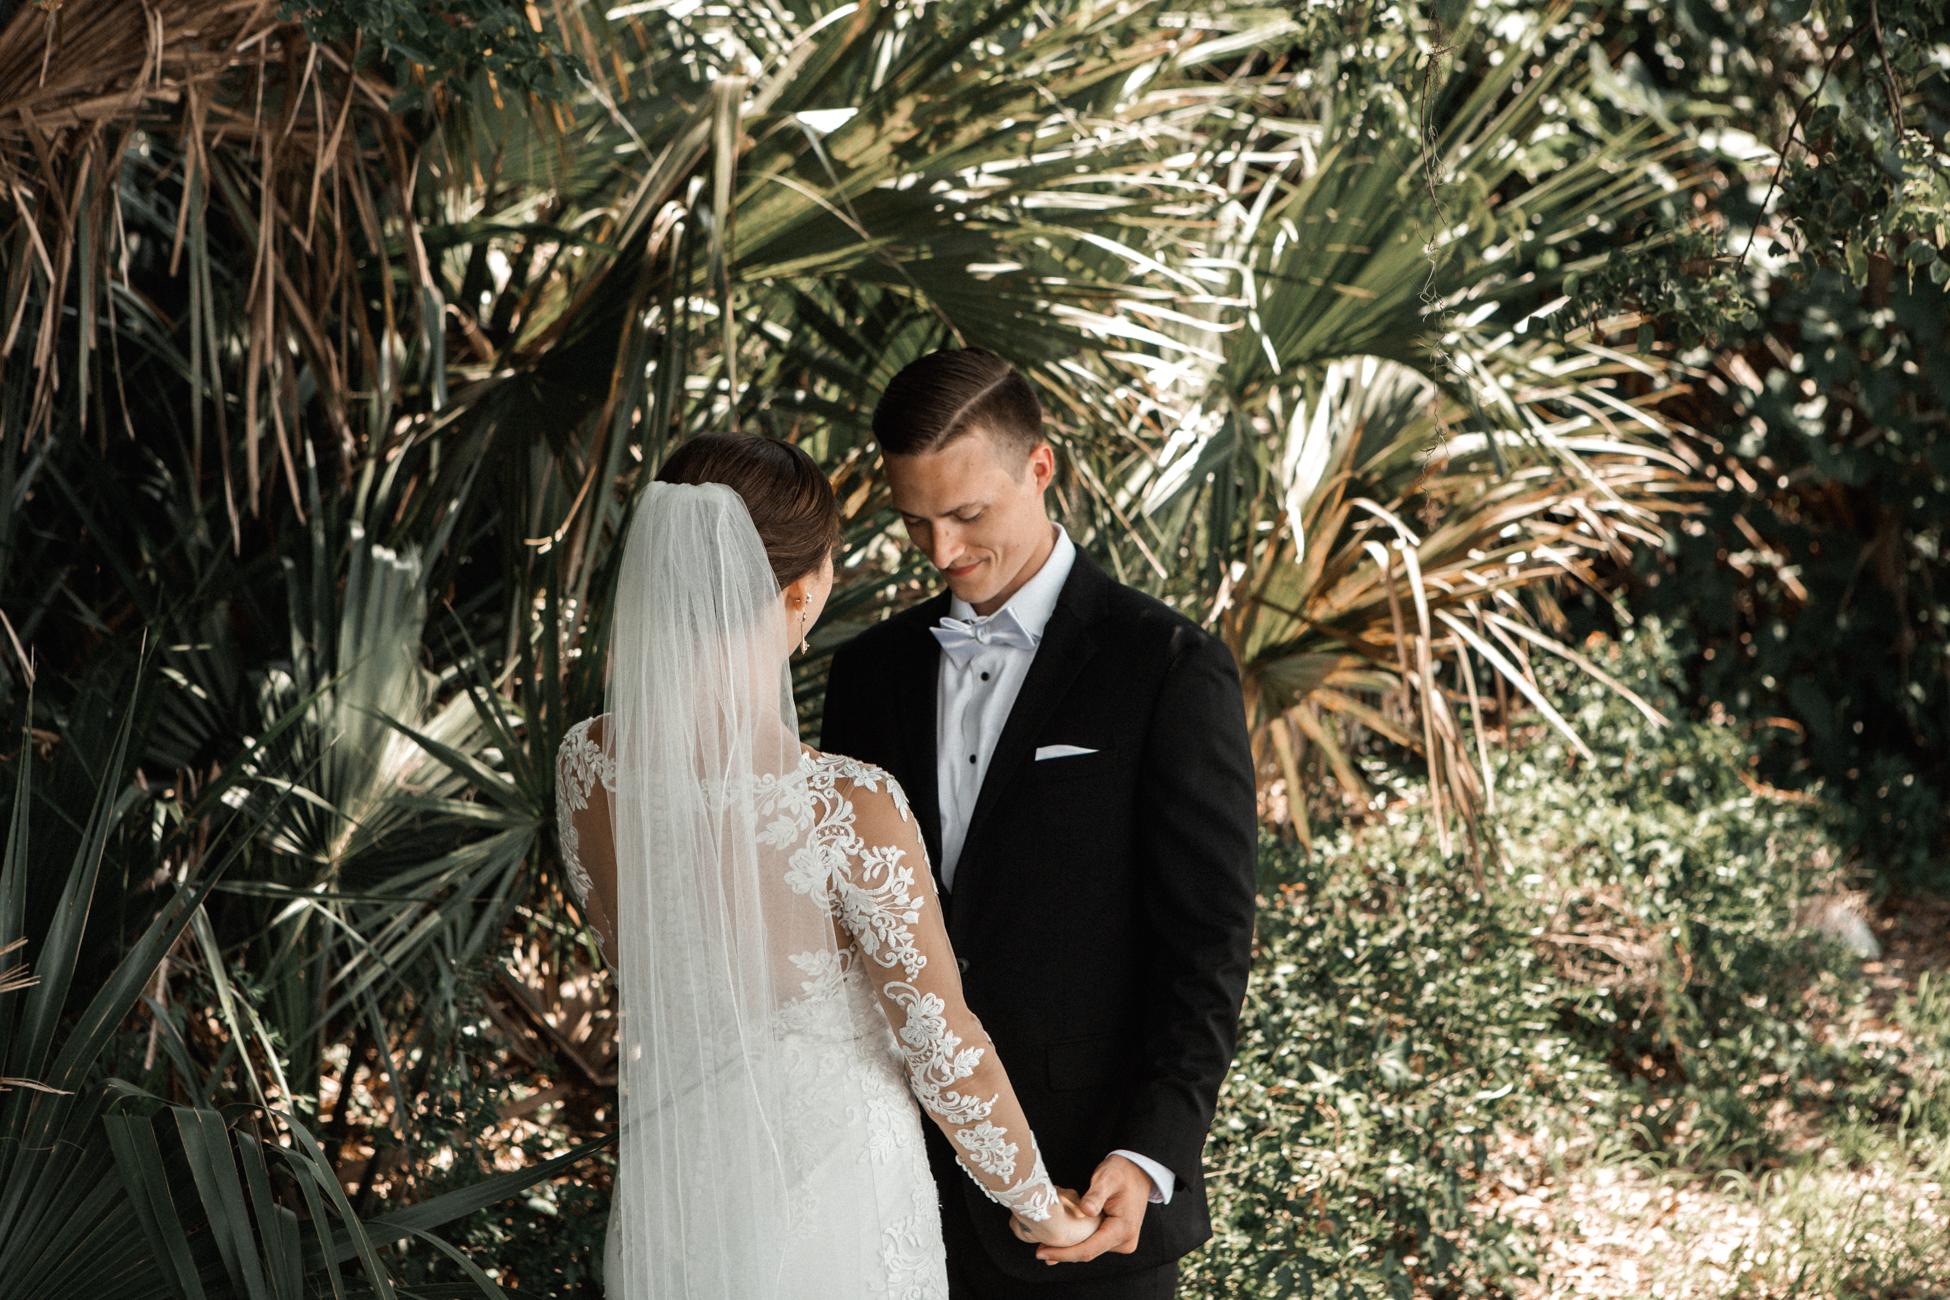 Wedding Day Small-11.jpg